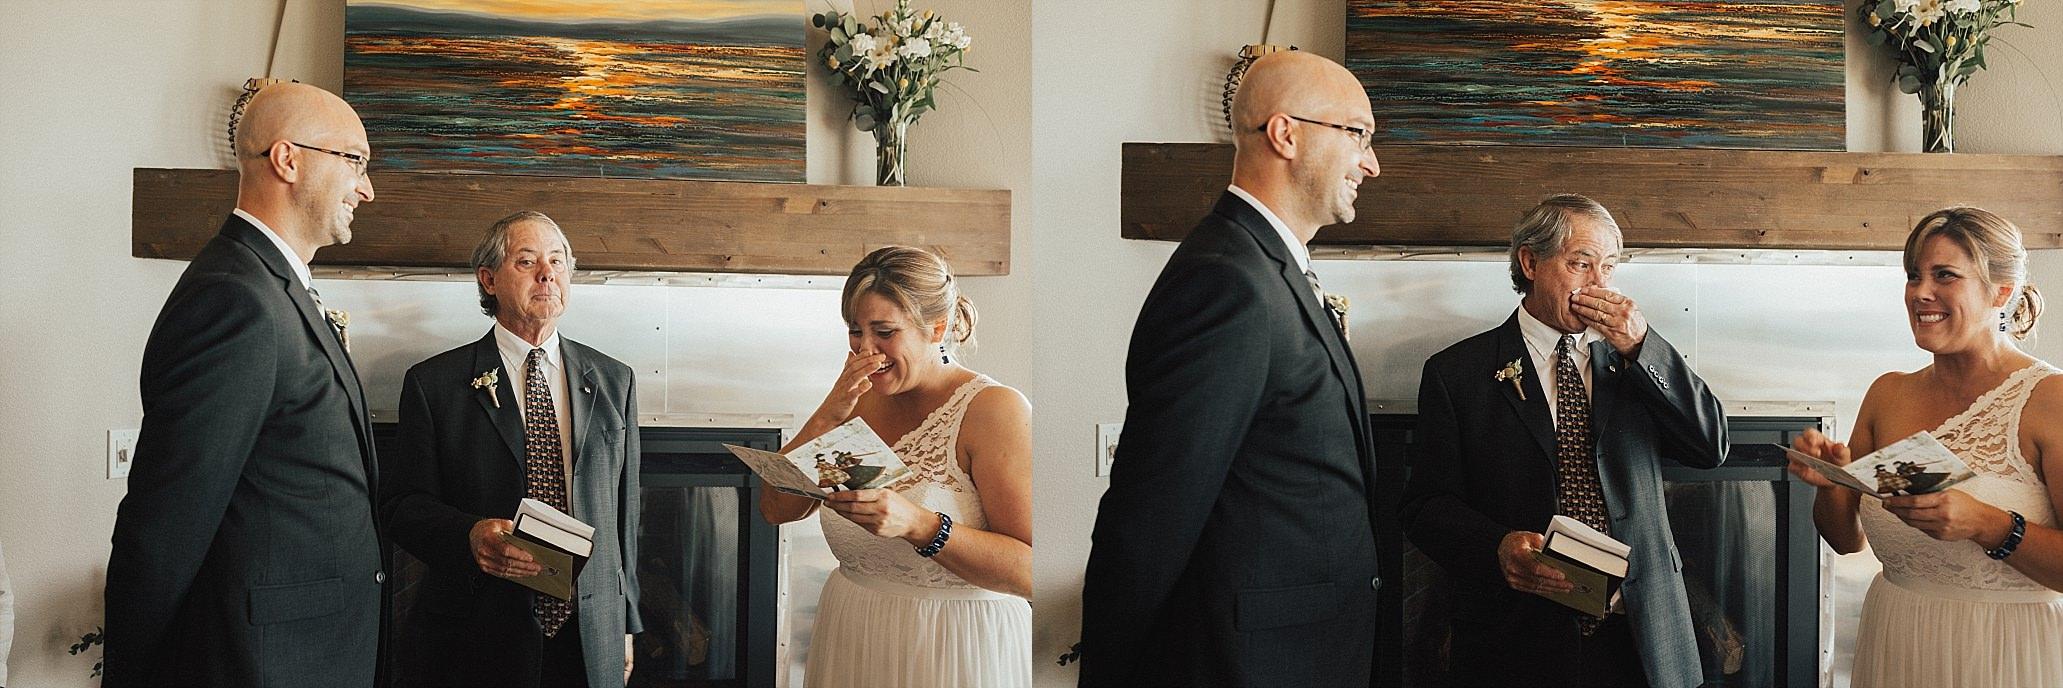 Oregon Coast Wedding Photographer (25).jpg